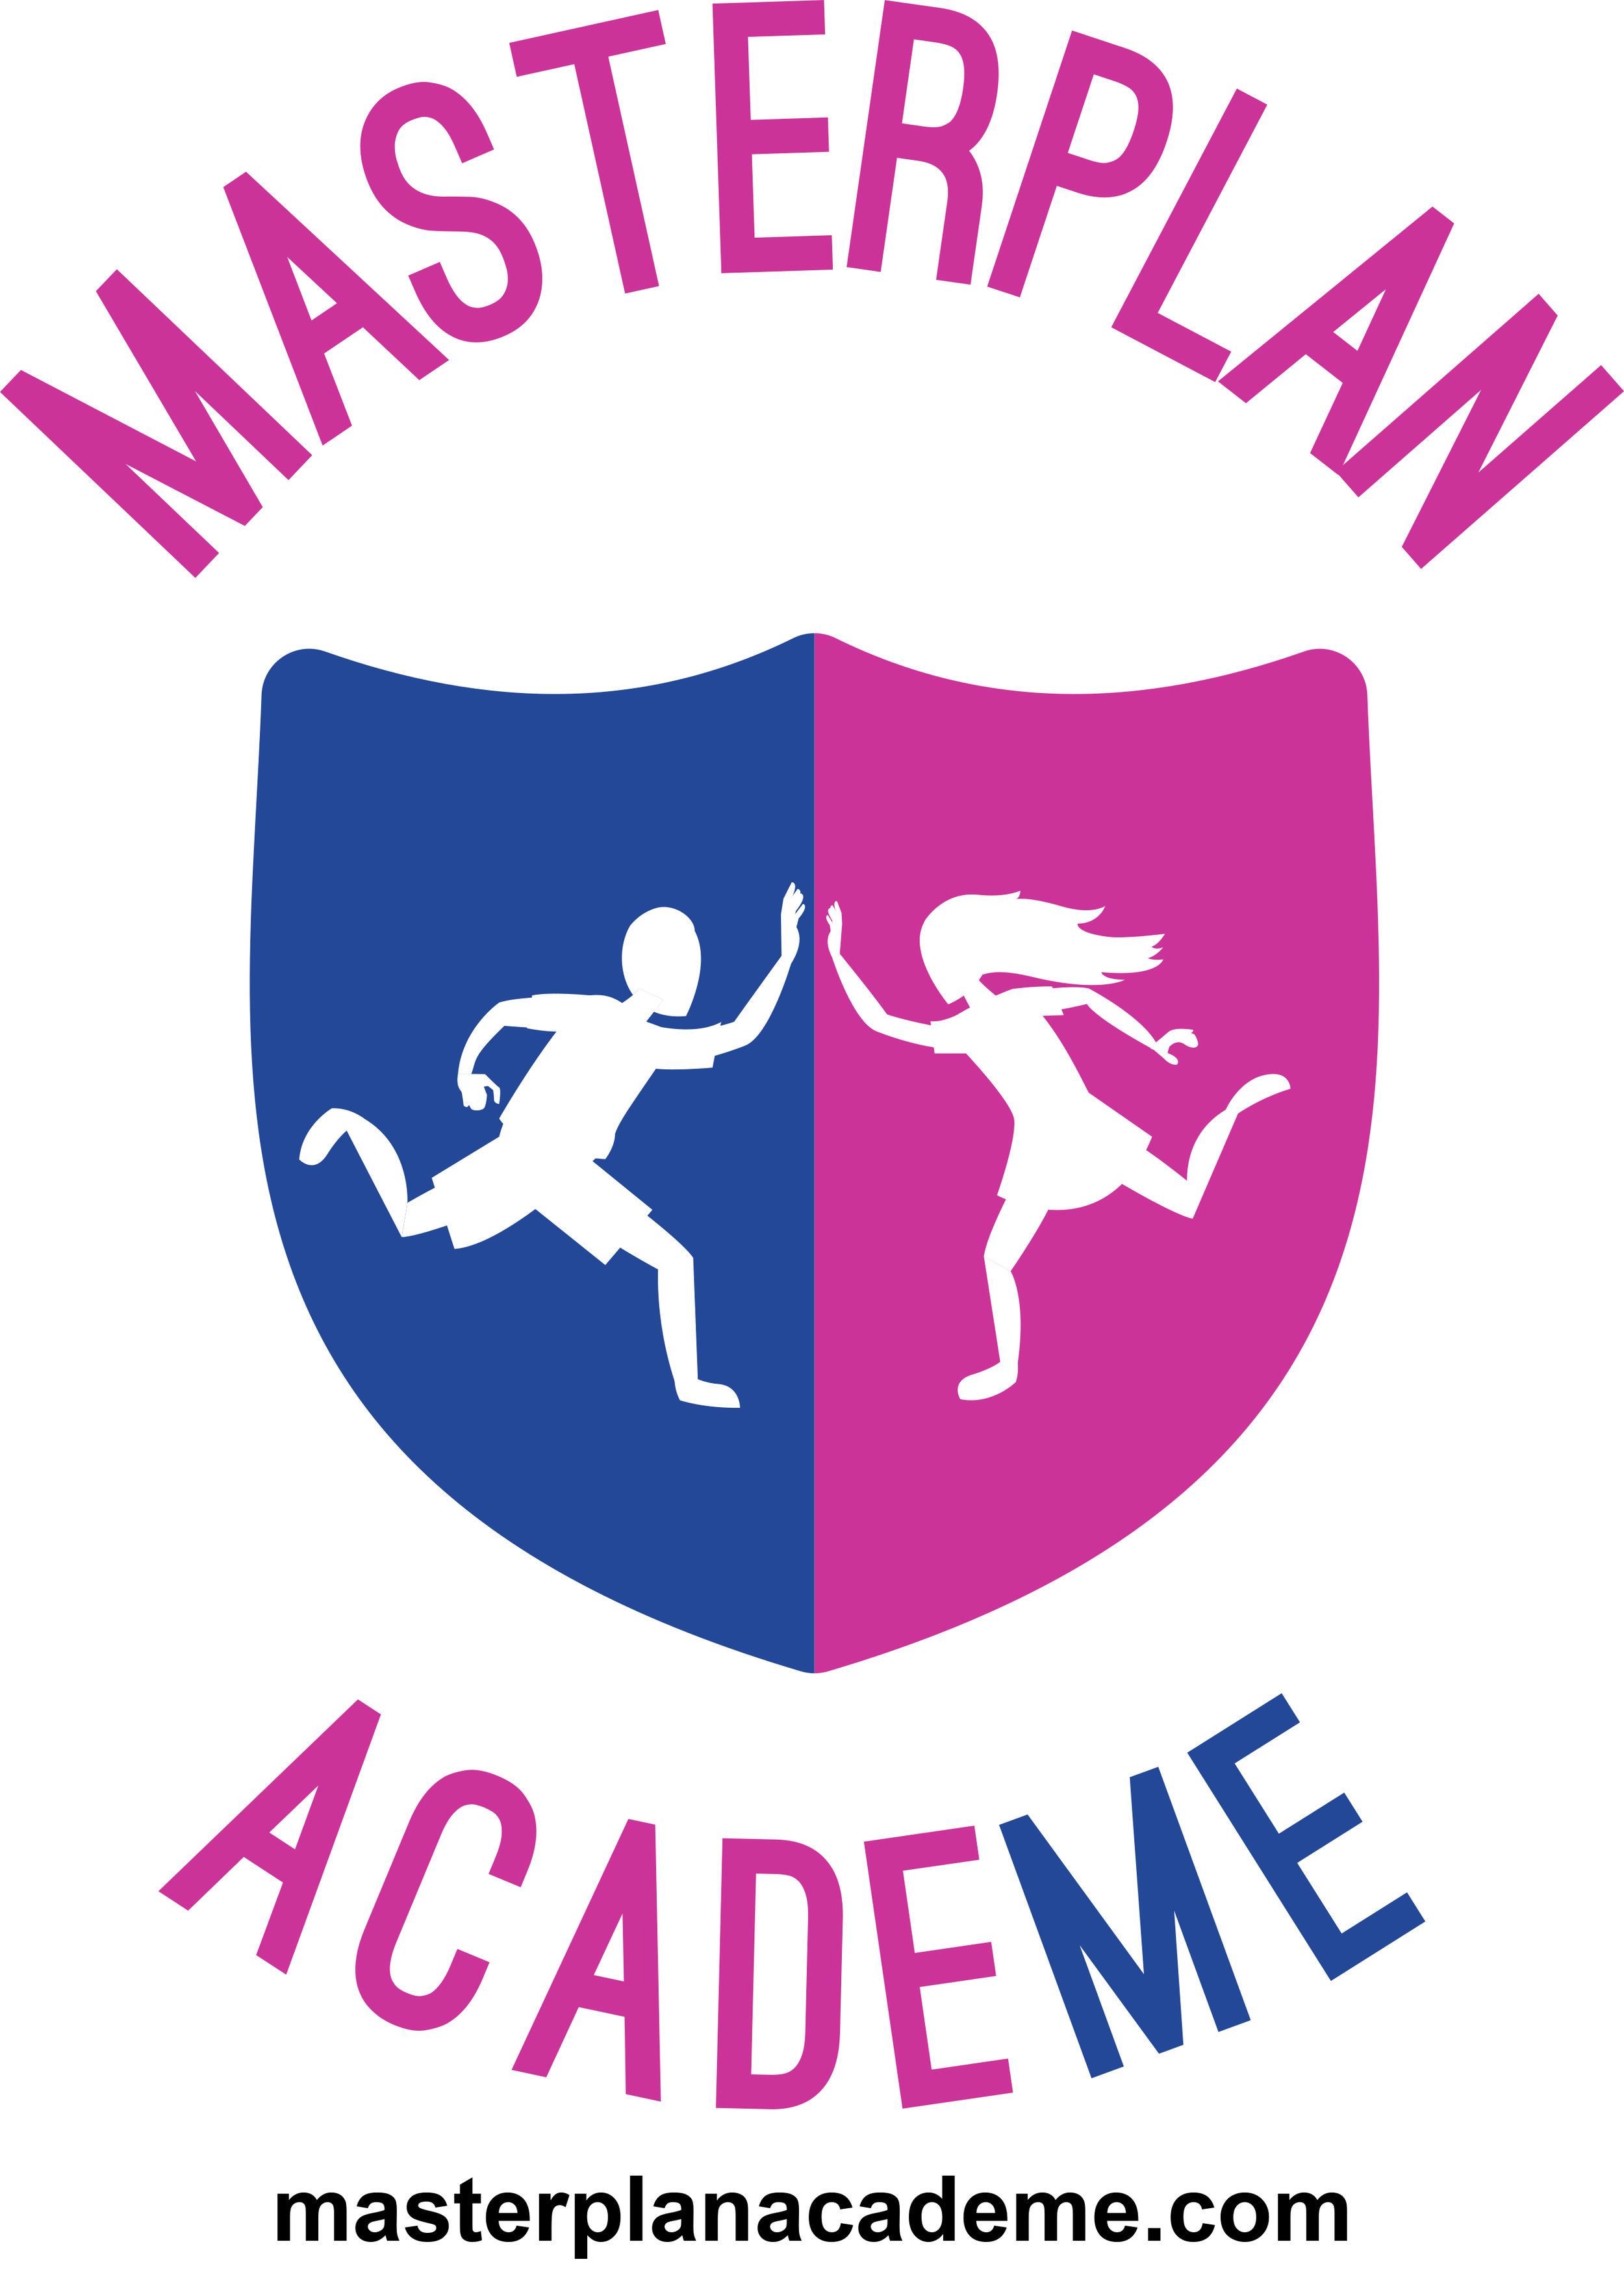 Master Plan AcadeME - Large Logo with website.jpg